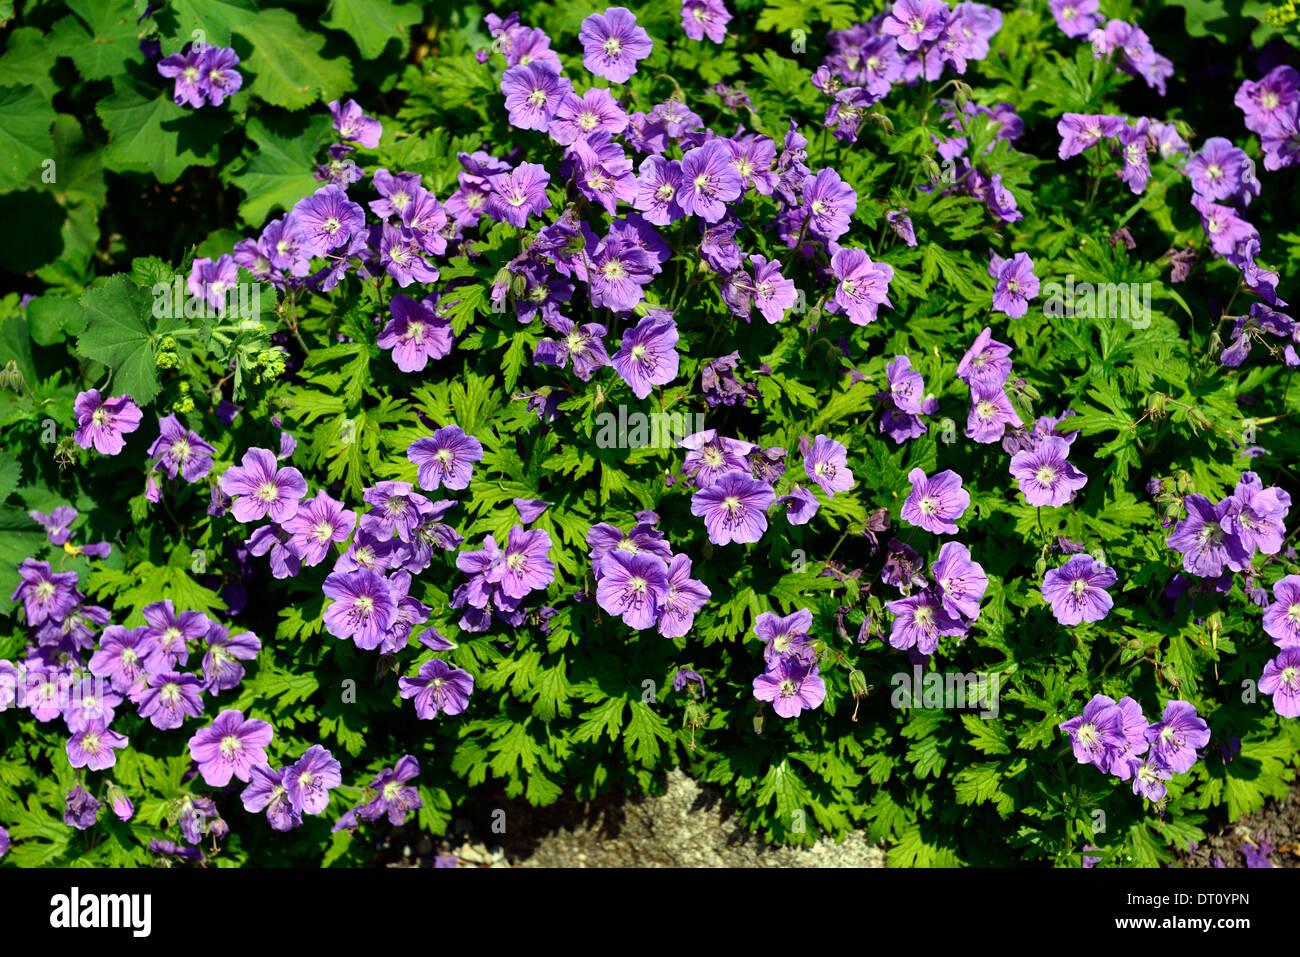 Geranium Purple Perennials Flowers Petals Plant Portraits